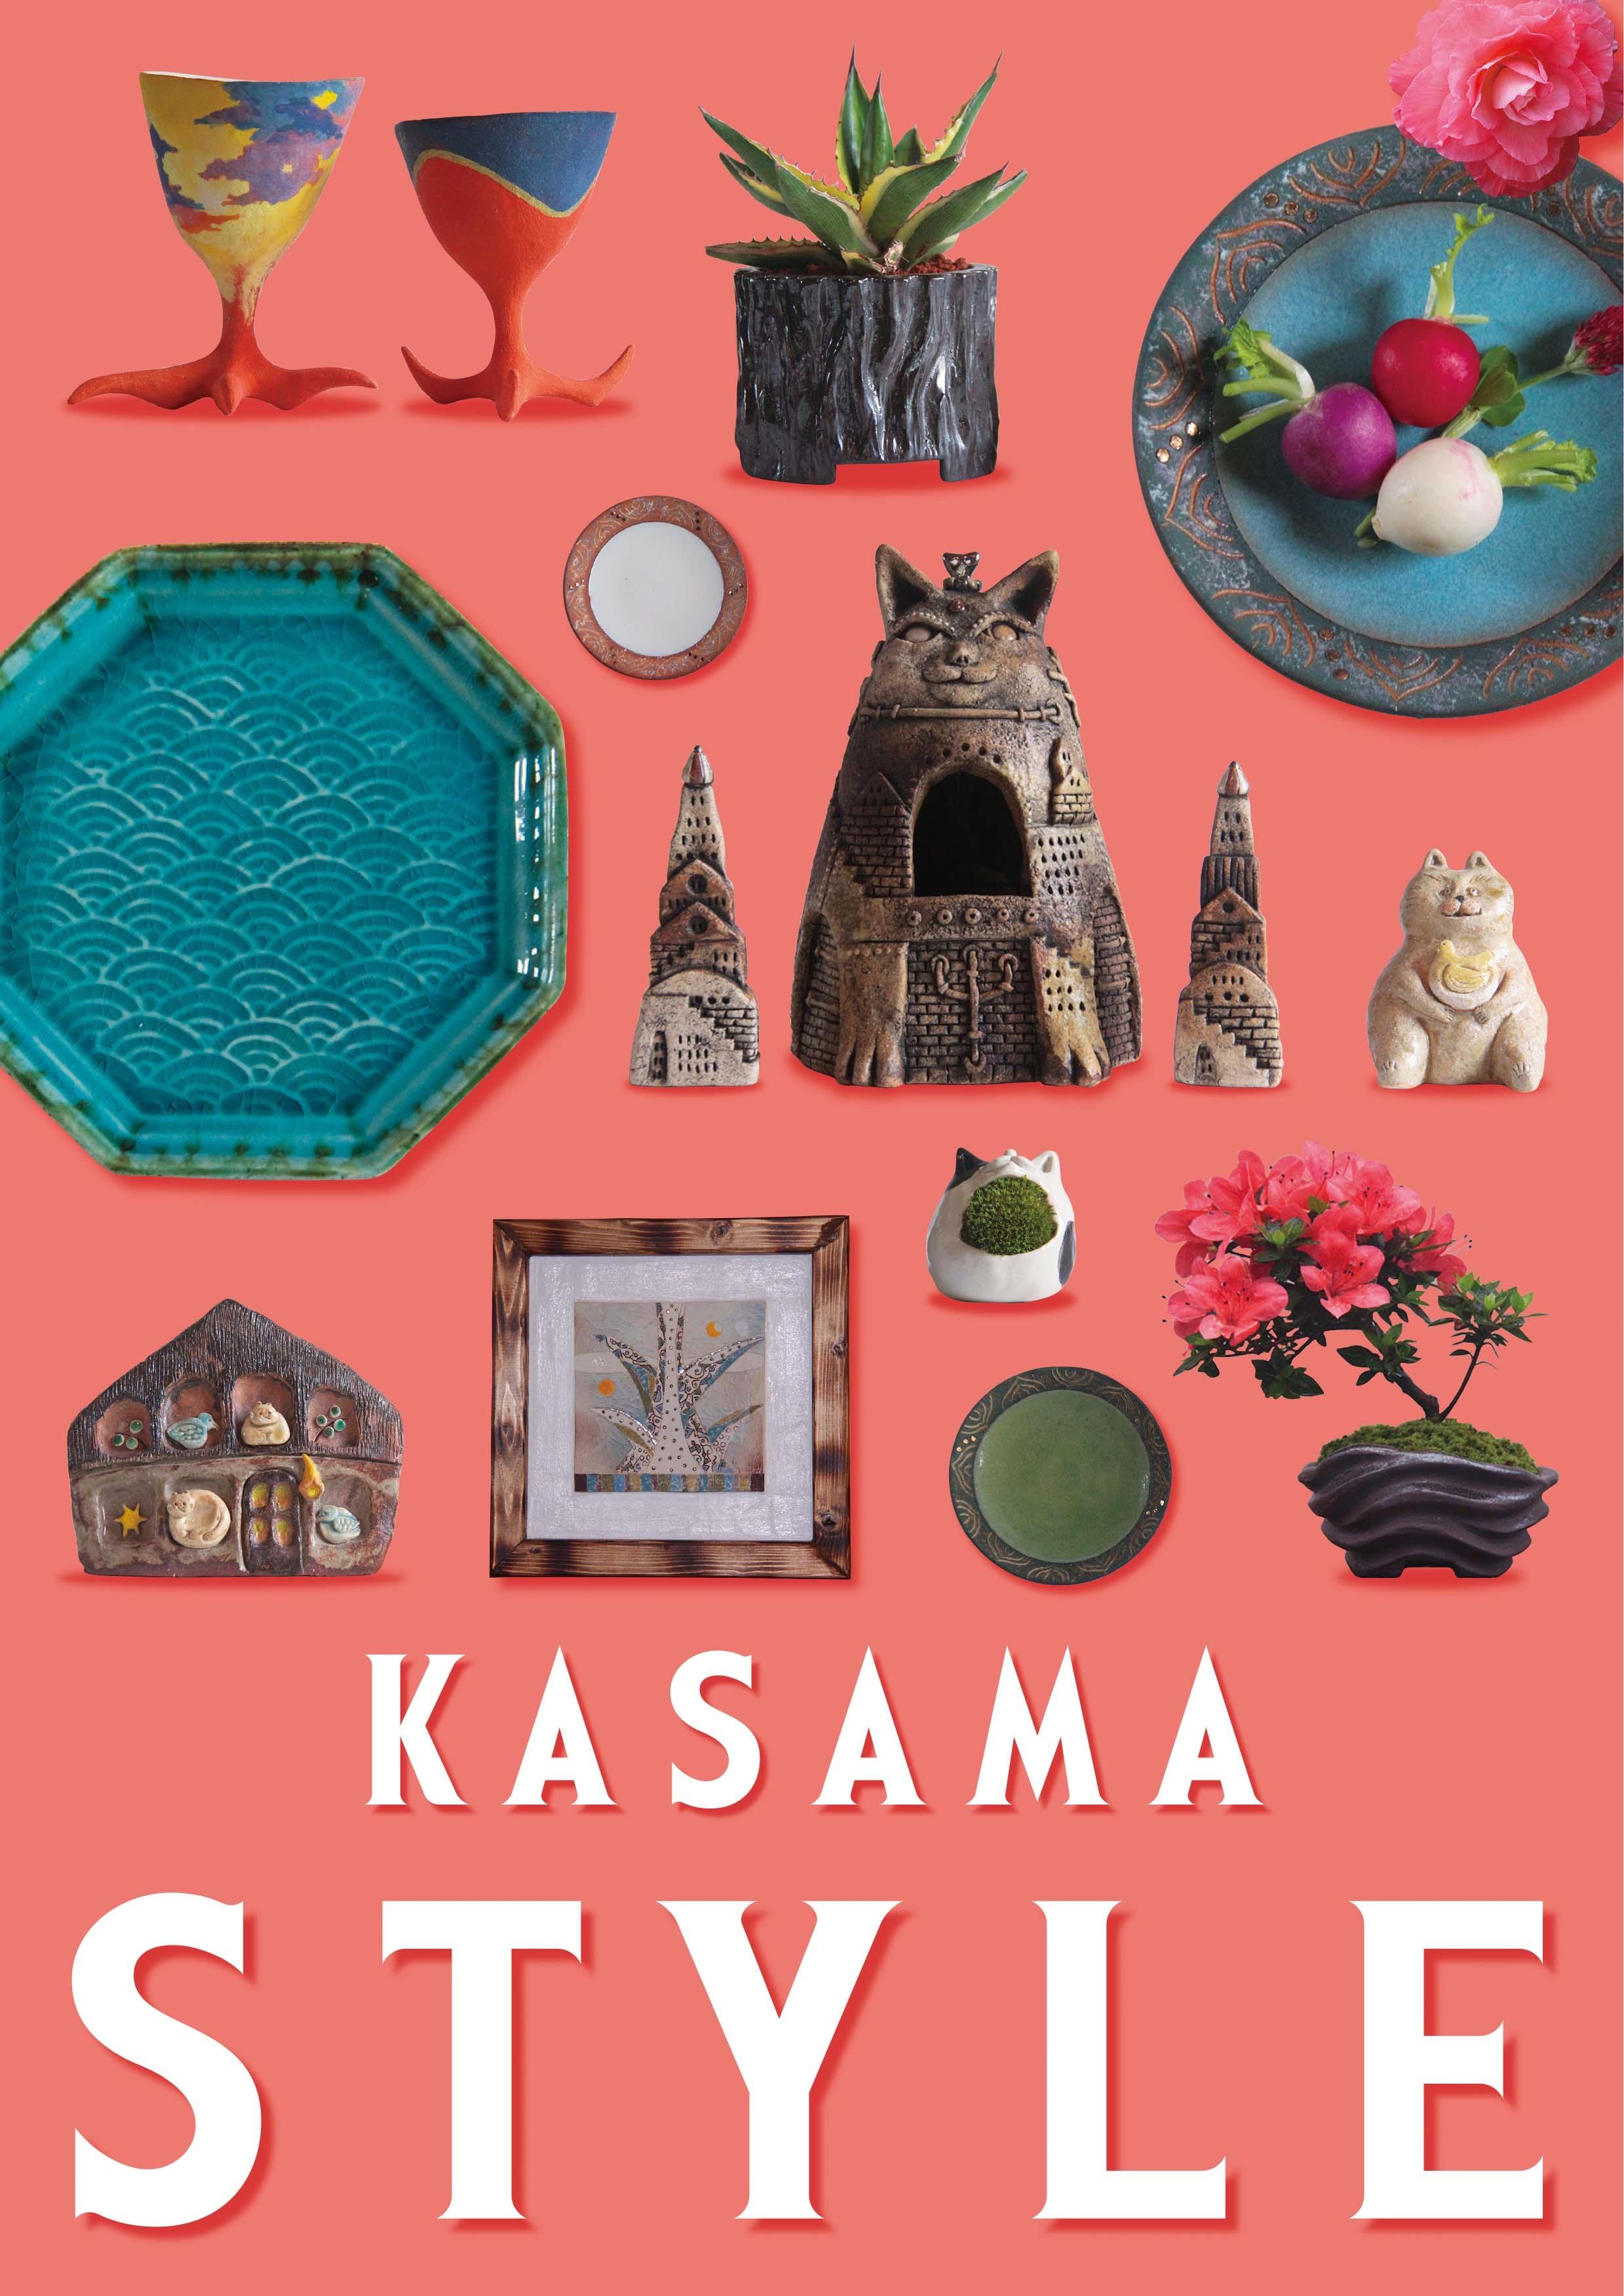 『KASAMA STYLE展』 茨城・笠間での開催のお知らせ